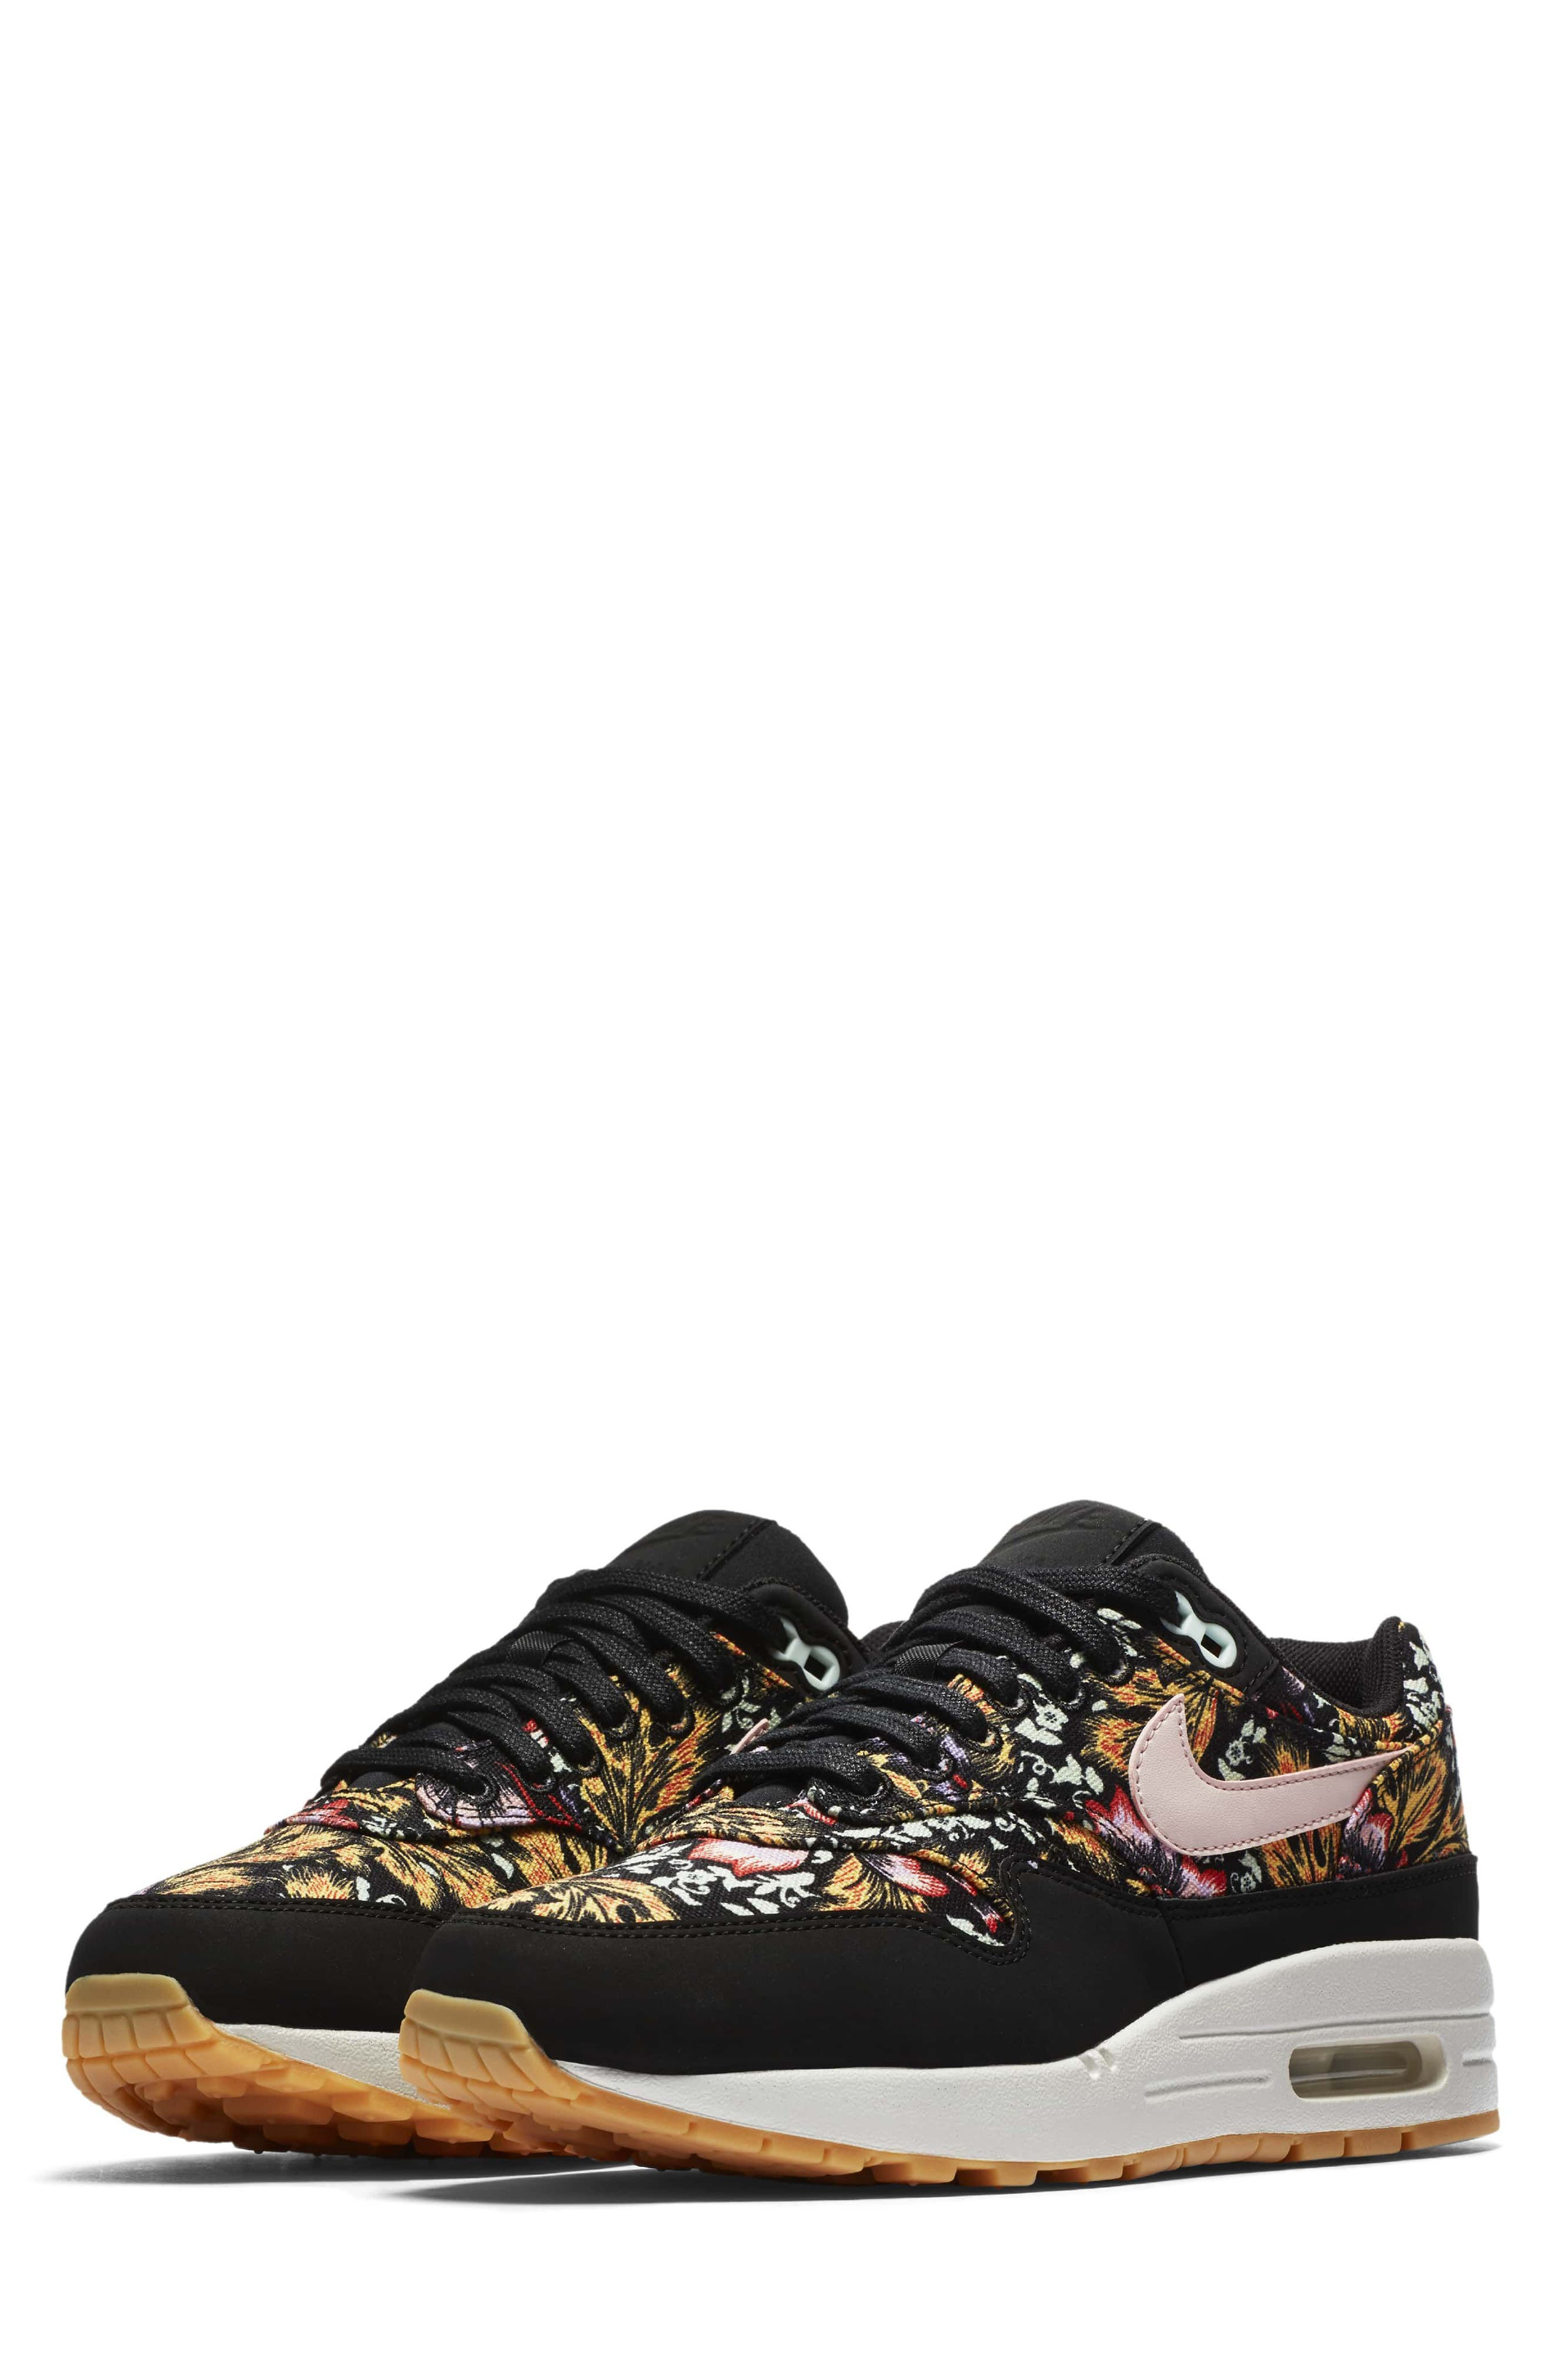 Air Max 1 QS Sneaker,                         Main,                         color, 003